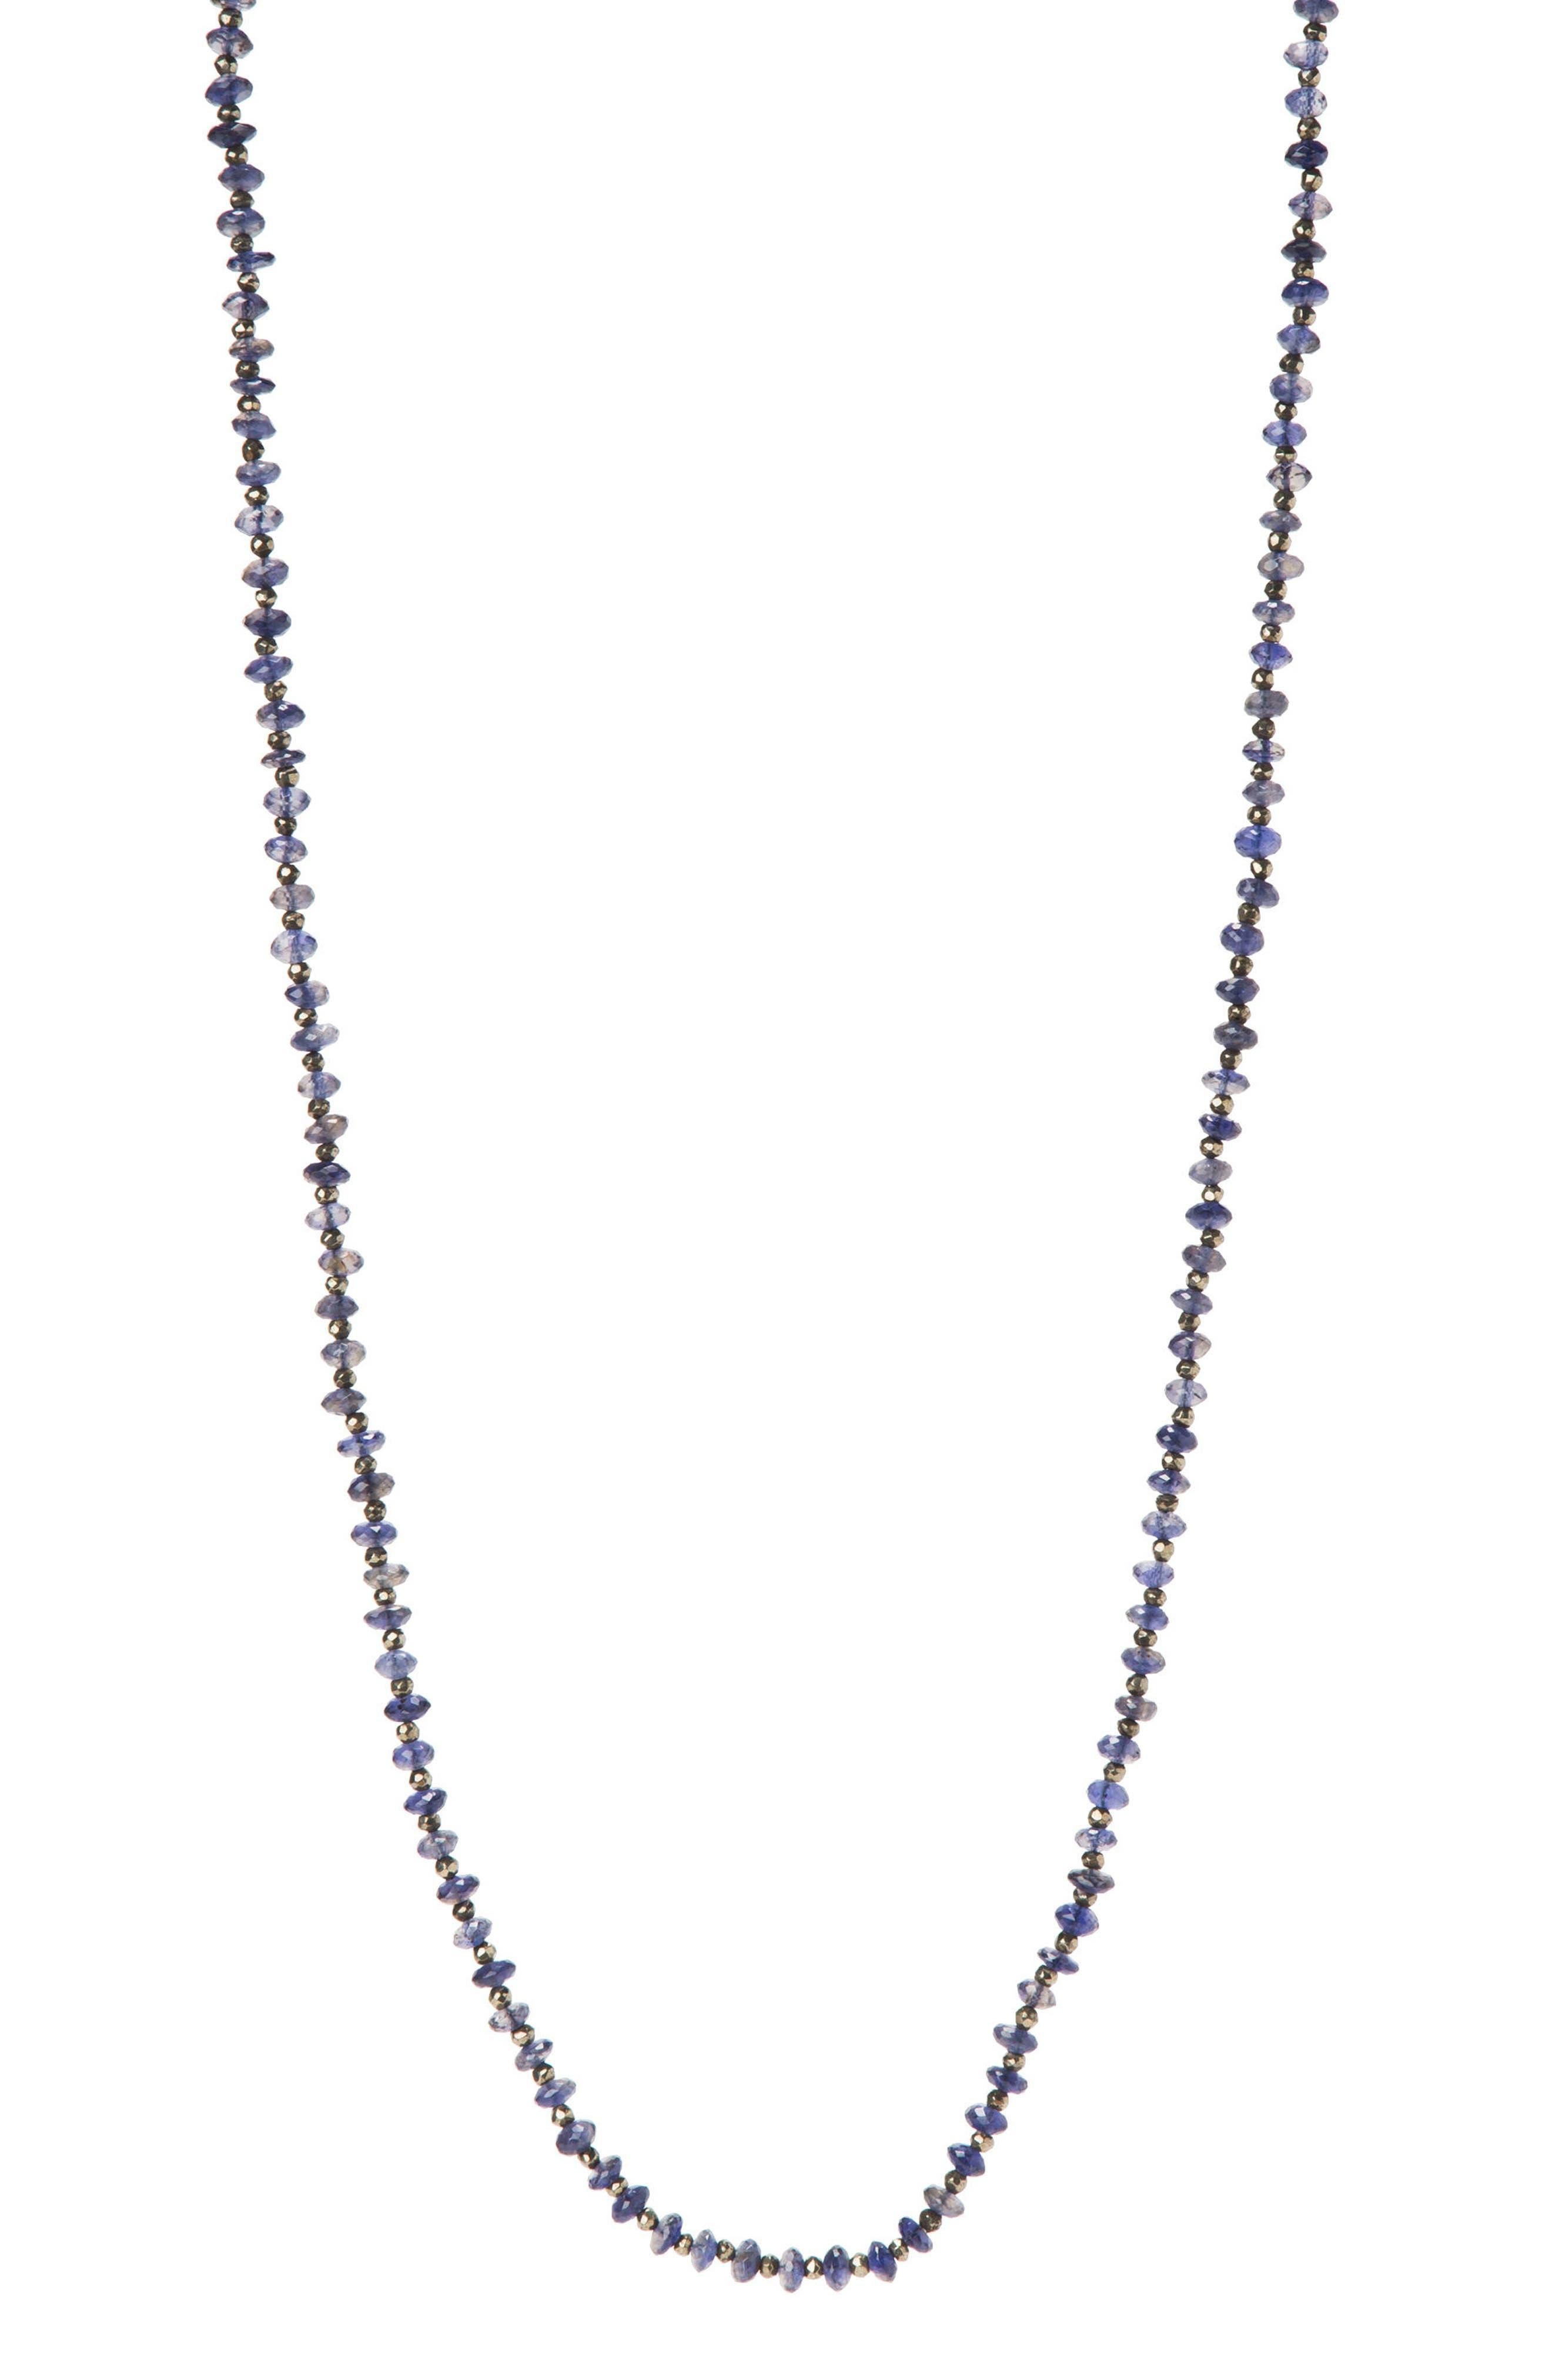 Solana Semiprecious Stone Necklace,                         Main,                         color, IOLITE